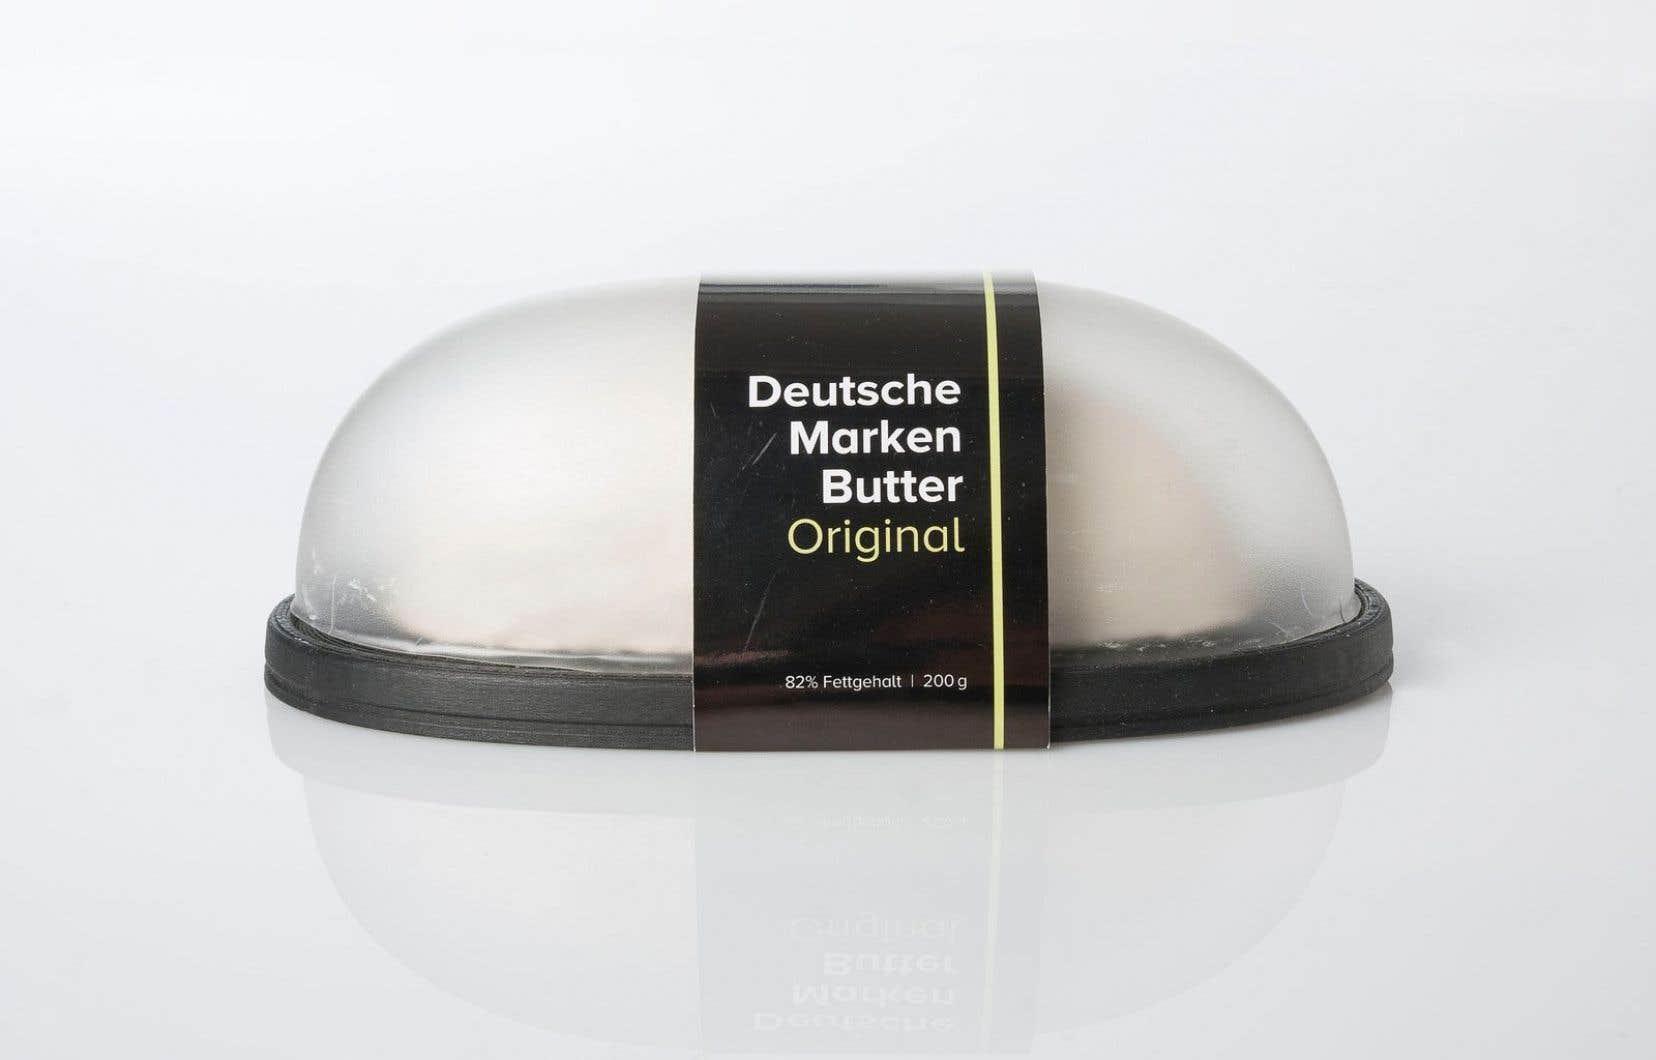 Le beurre Perfectionist de Gordon Rak, Philipp Kuehn, Katrin Kleemann (HTW - Berlin) arrive directement dans son beurrier 100% recyclable.